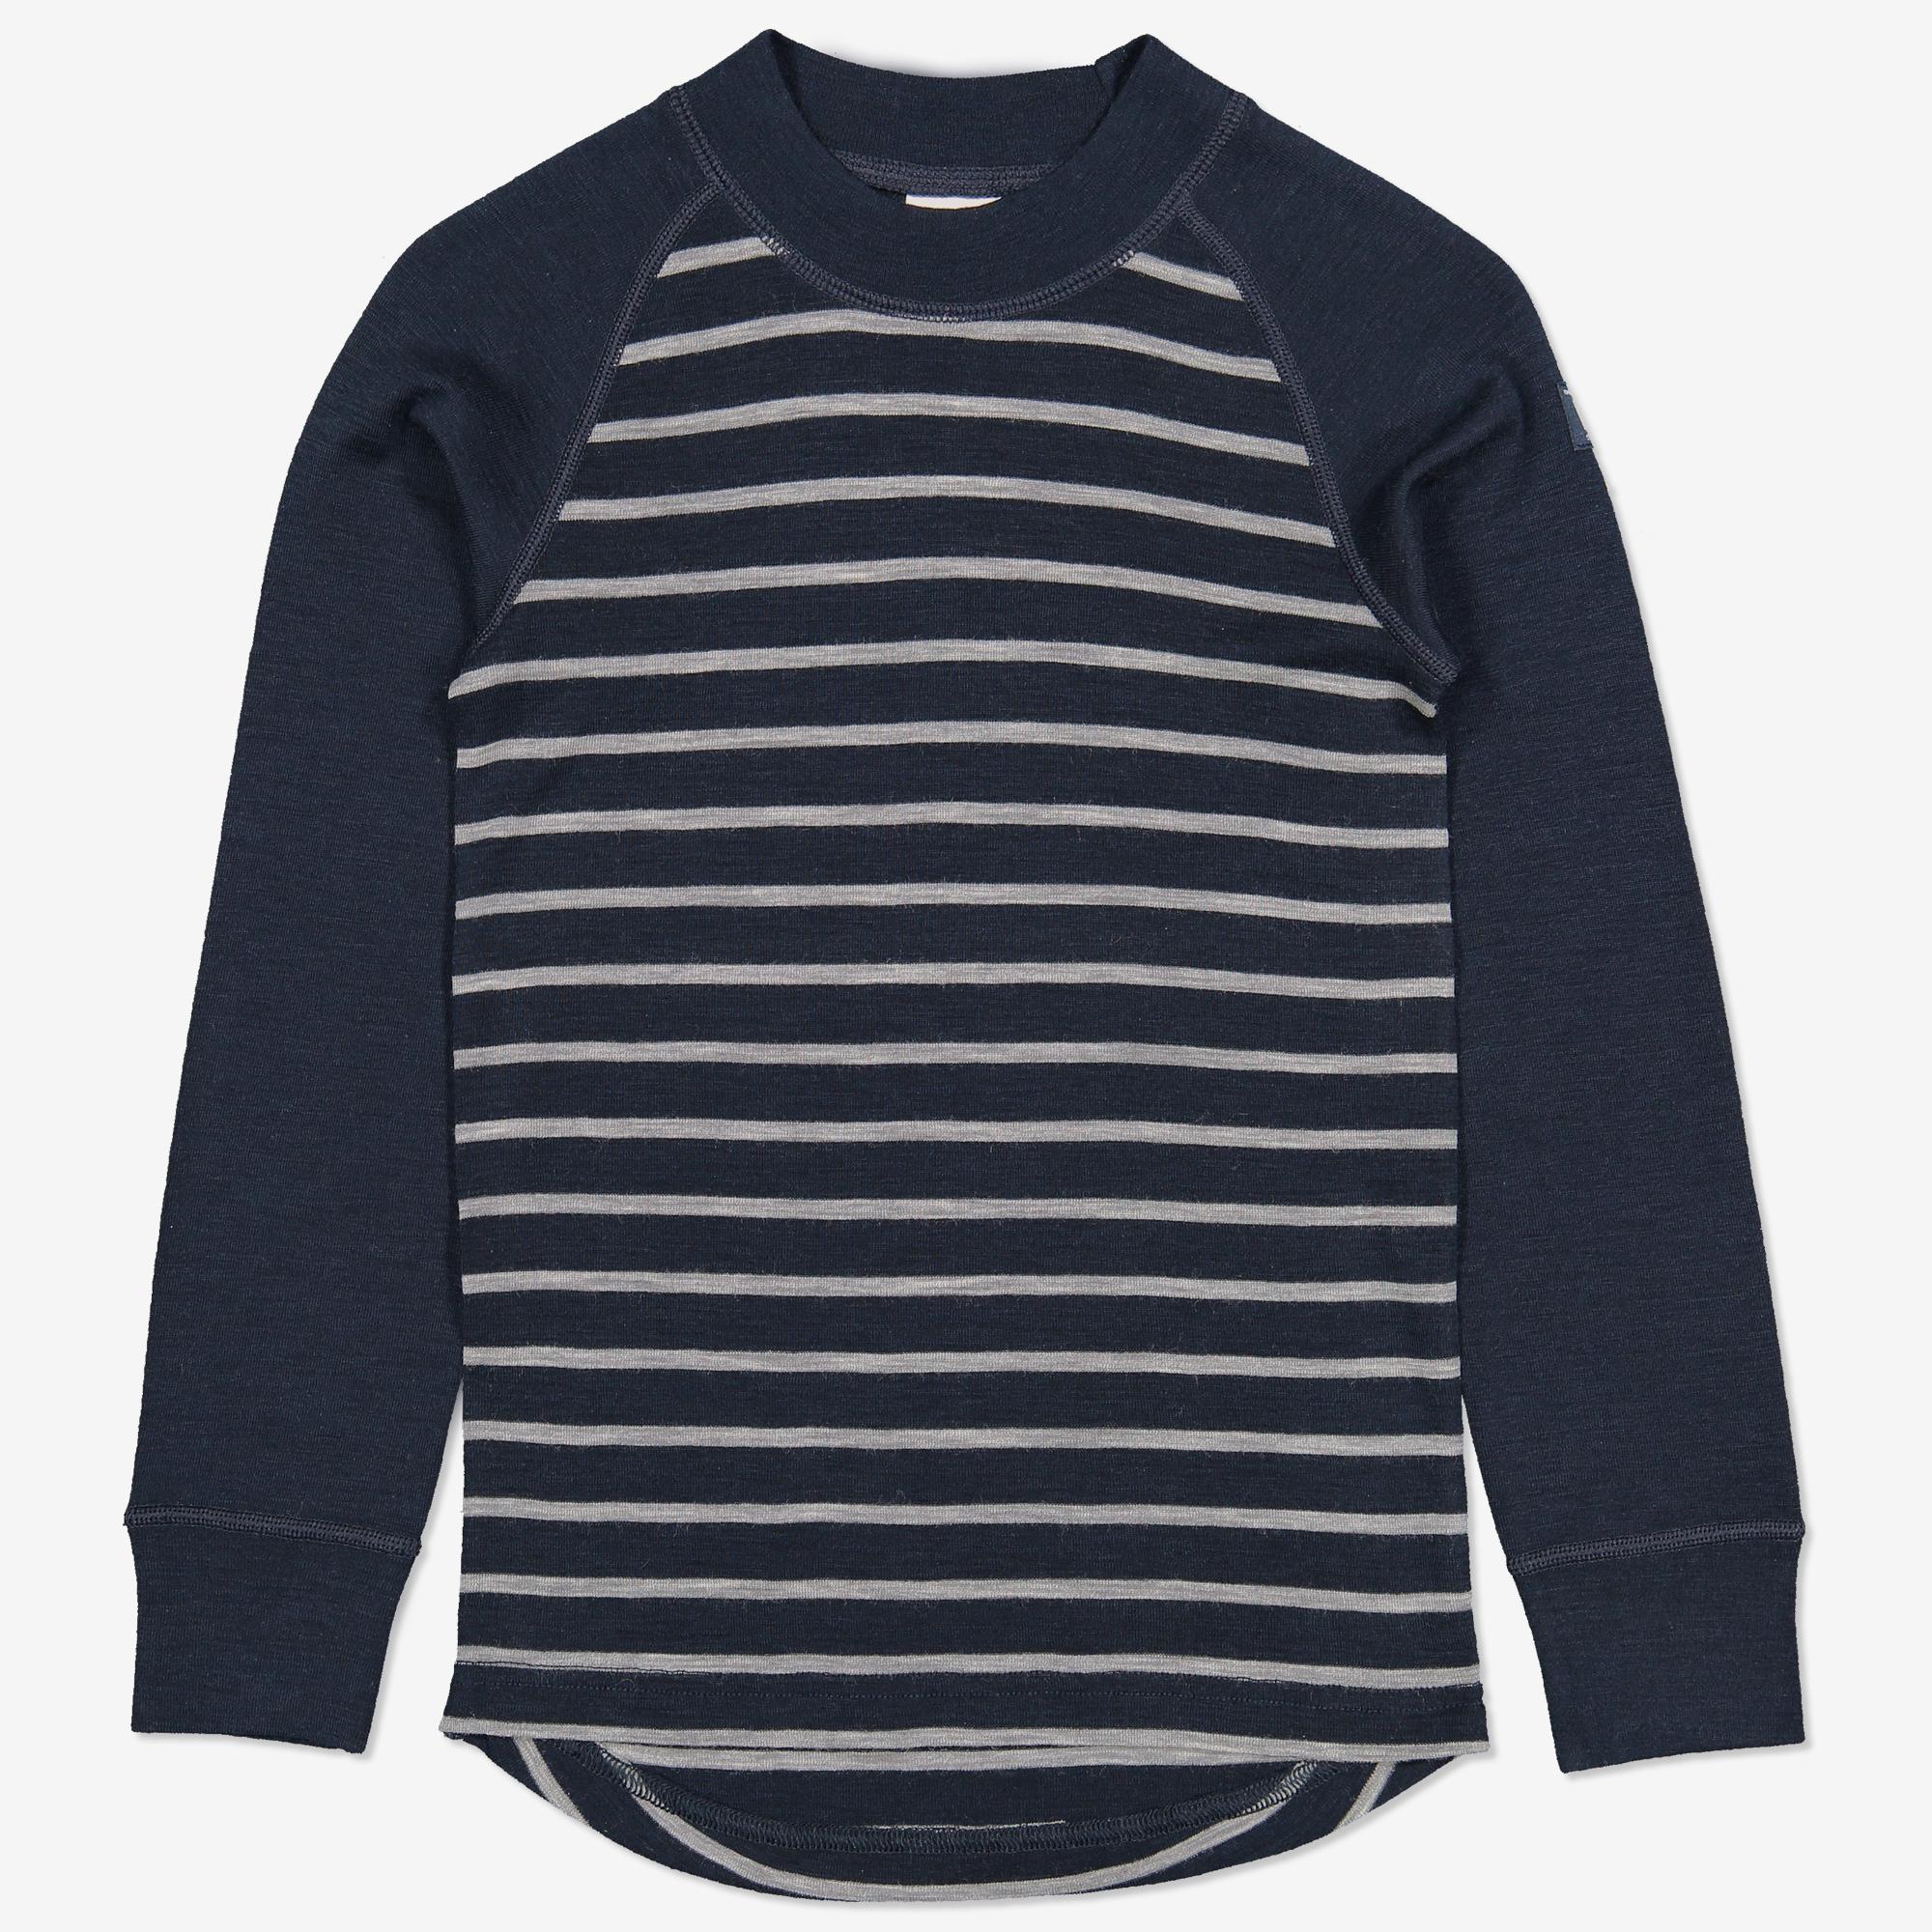 Merinoull randig tröja mörk marinblå